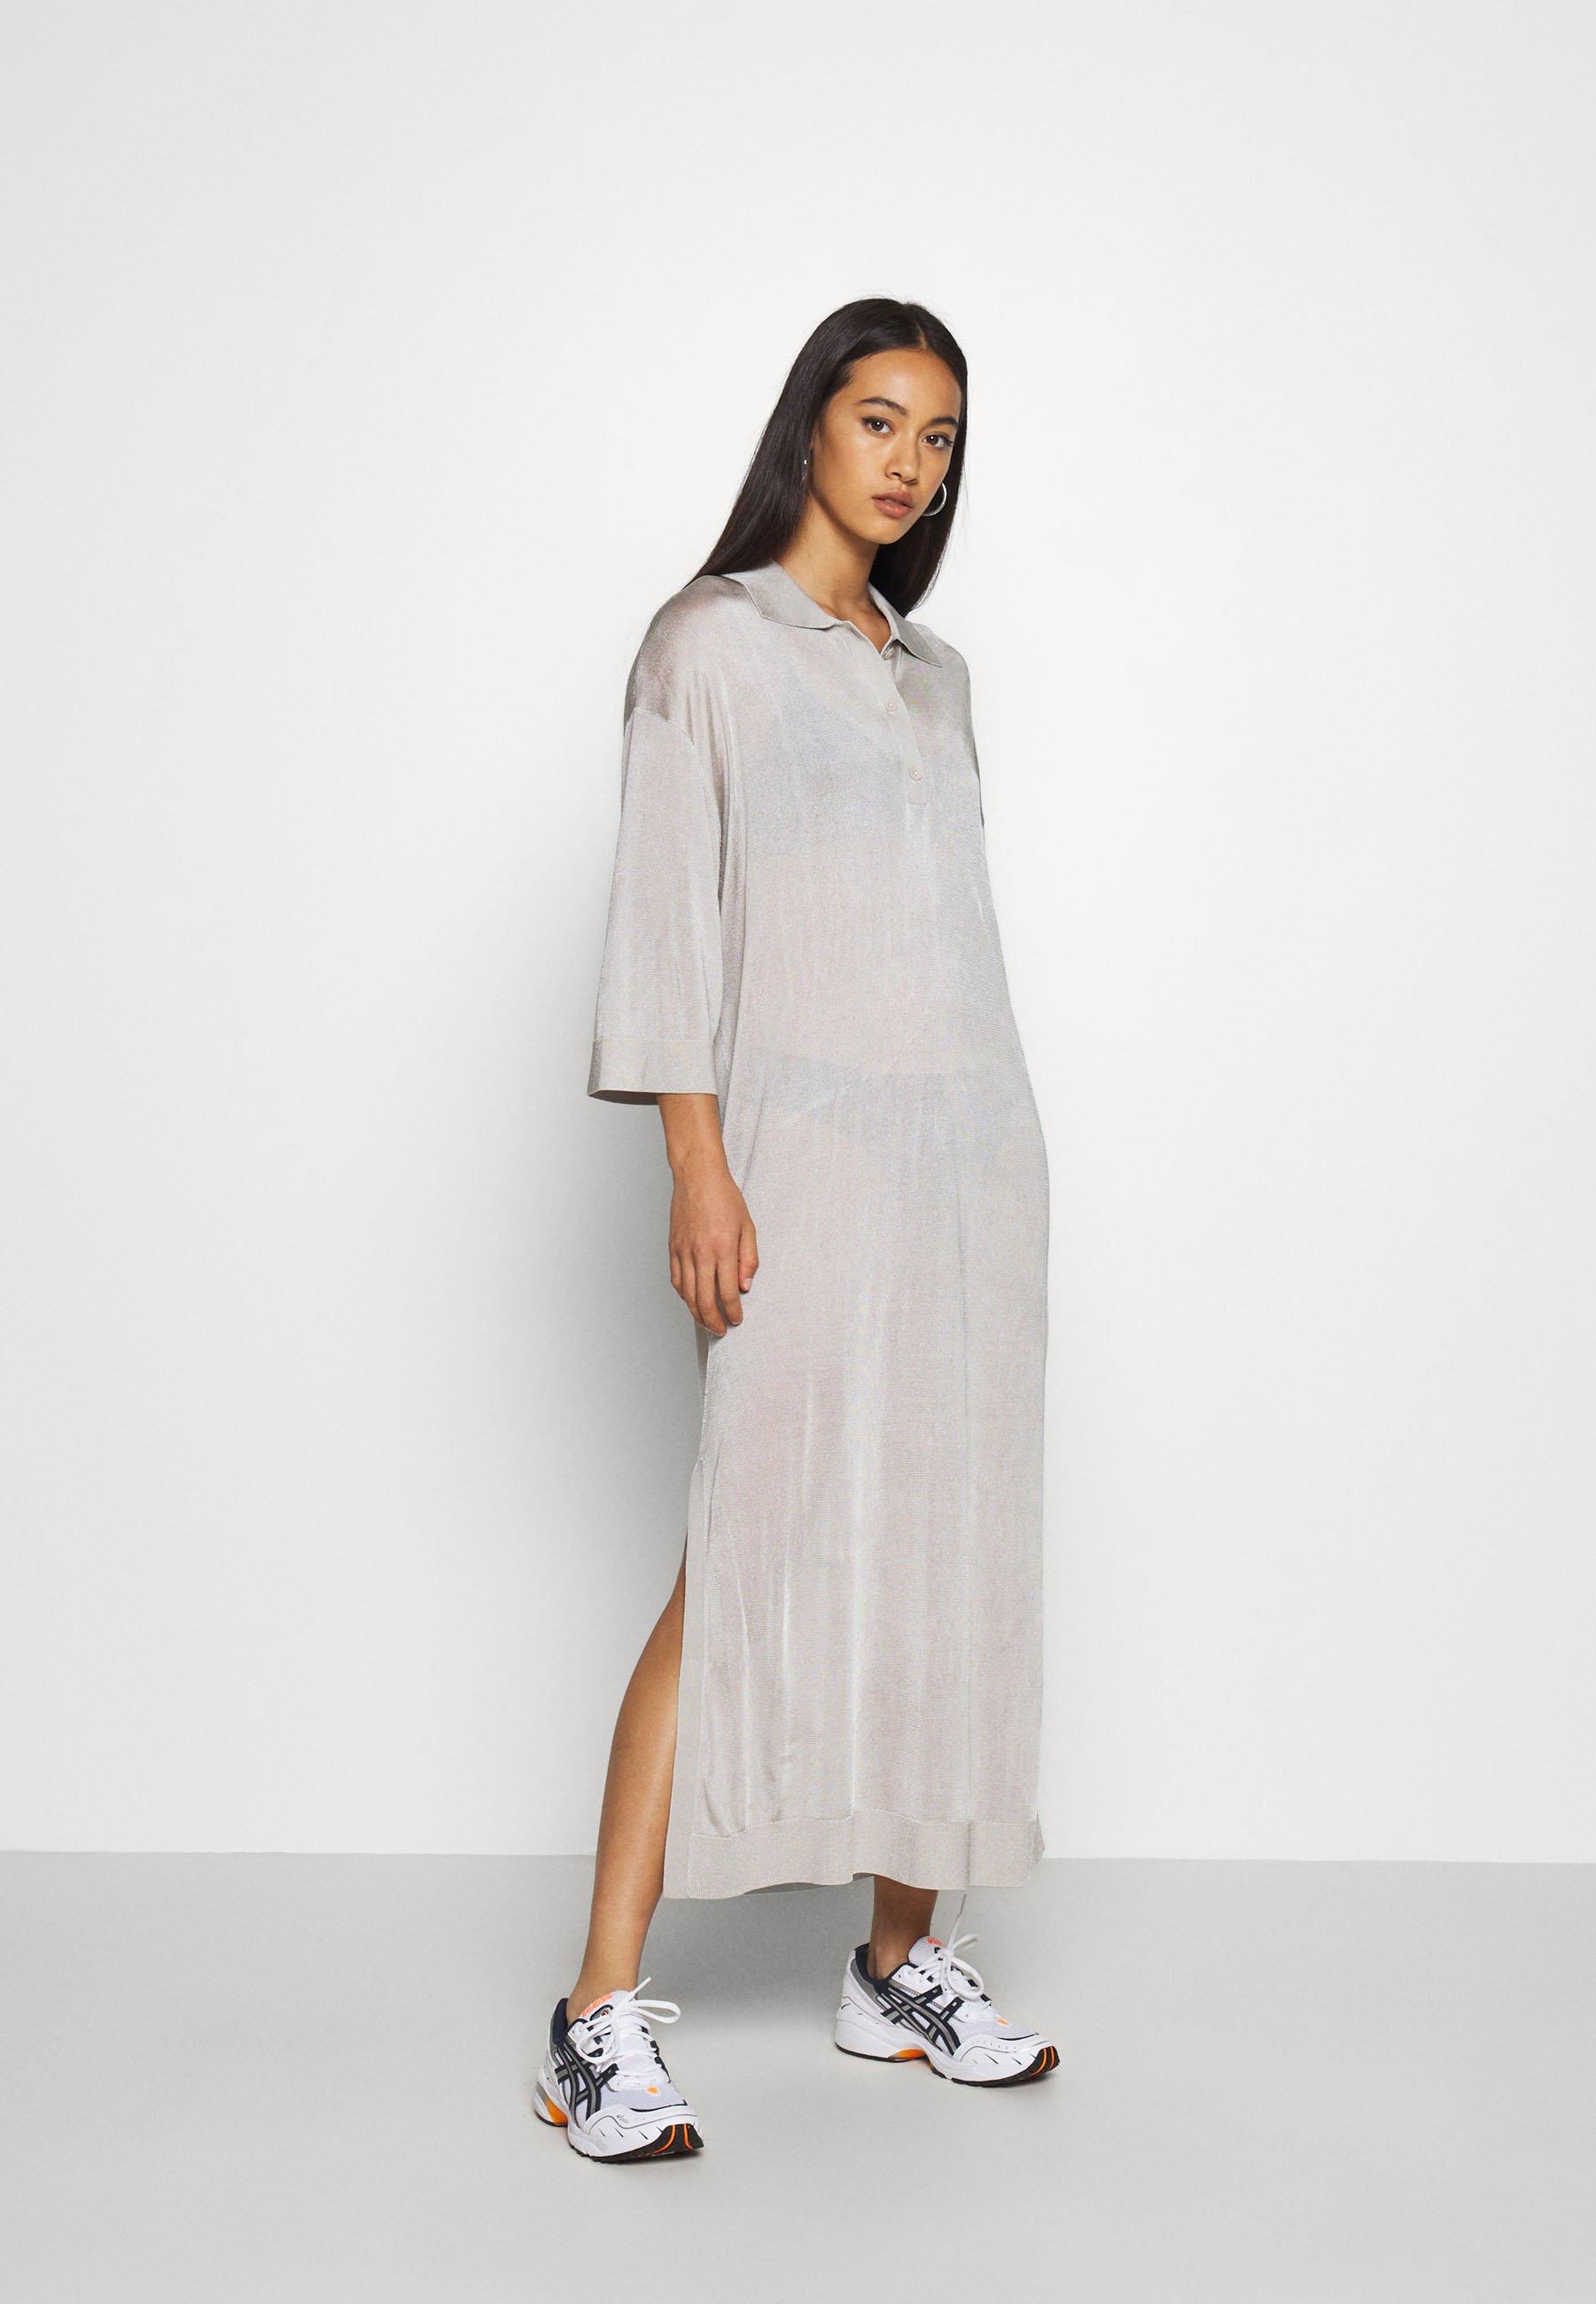 Weekday MONIQUE DRESS - Robe d'été - beige - Robes femme kr4bY